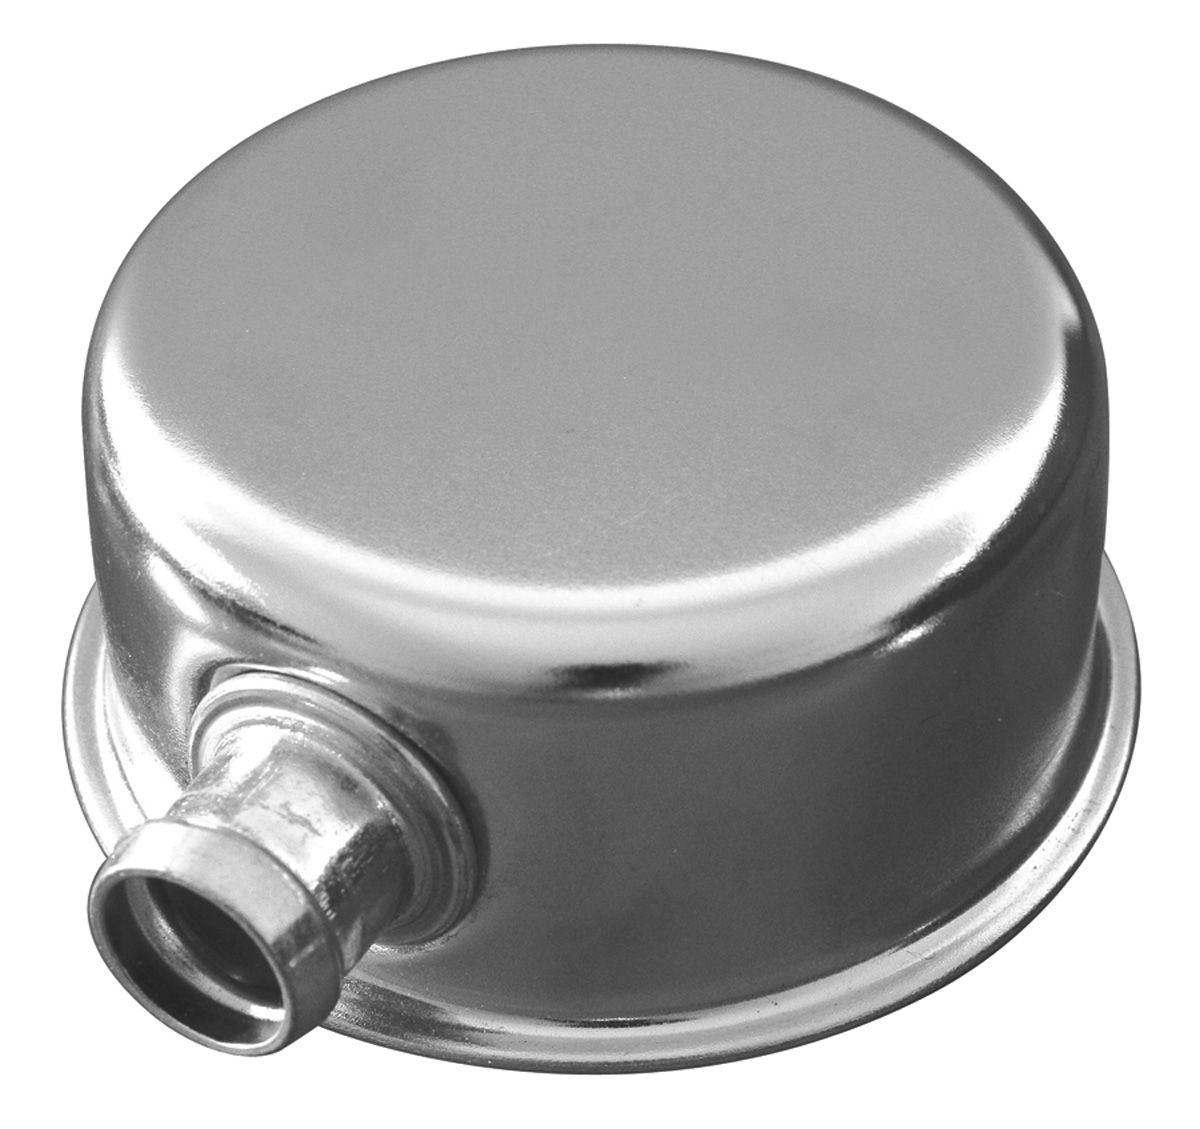 Oil Fill Cap, w/ Vent, 1954-67 Cadillac, Push-On